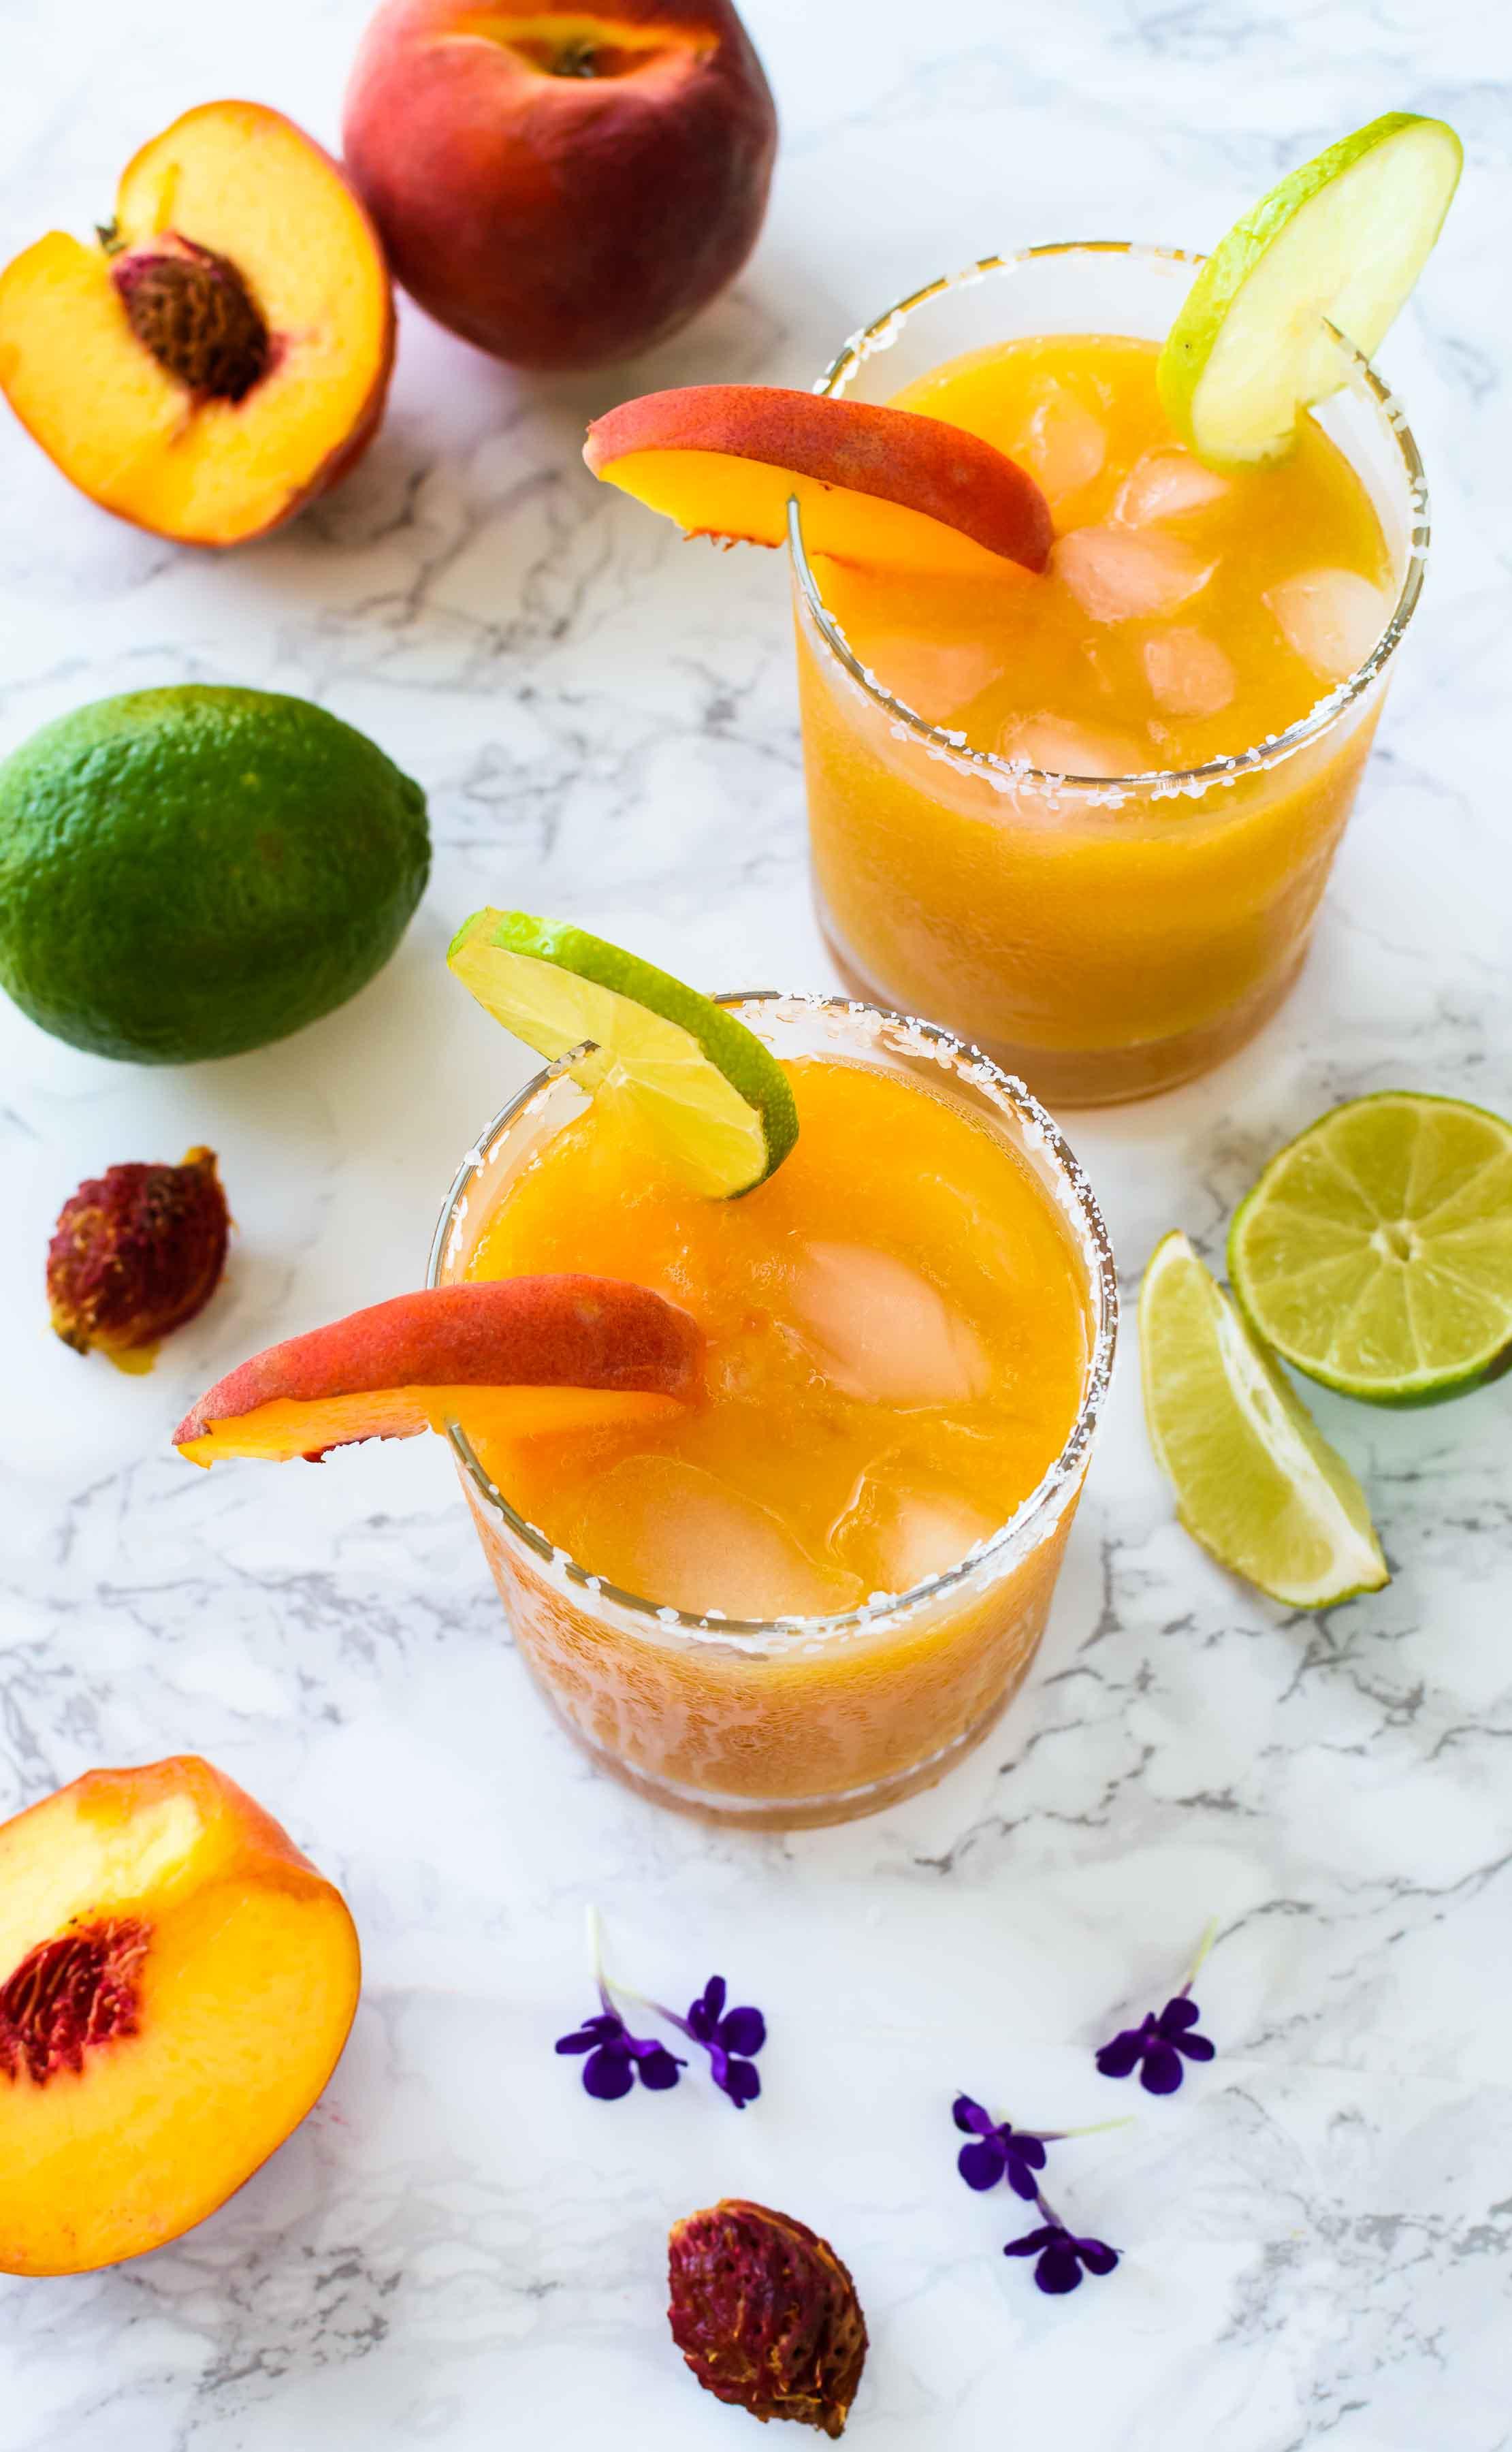 Peach Margarita- Pepper Delight #pepperdelightblog #recipe #margarita #peach #drinks #cocktails #cincodemayo #mexican #summerdrinks #summerishere #summercocktails #peachdrinks